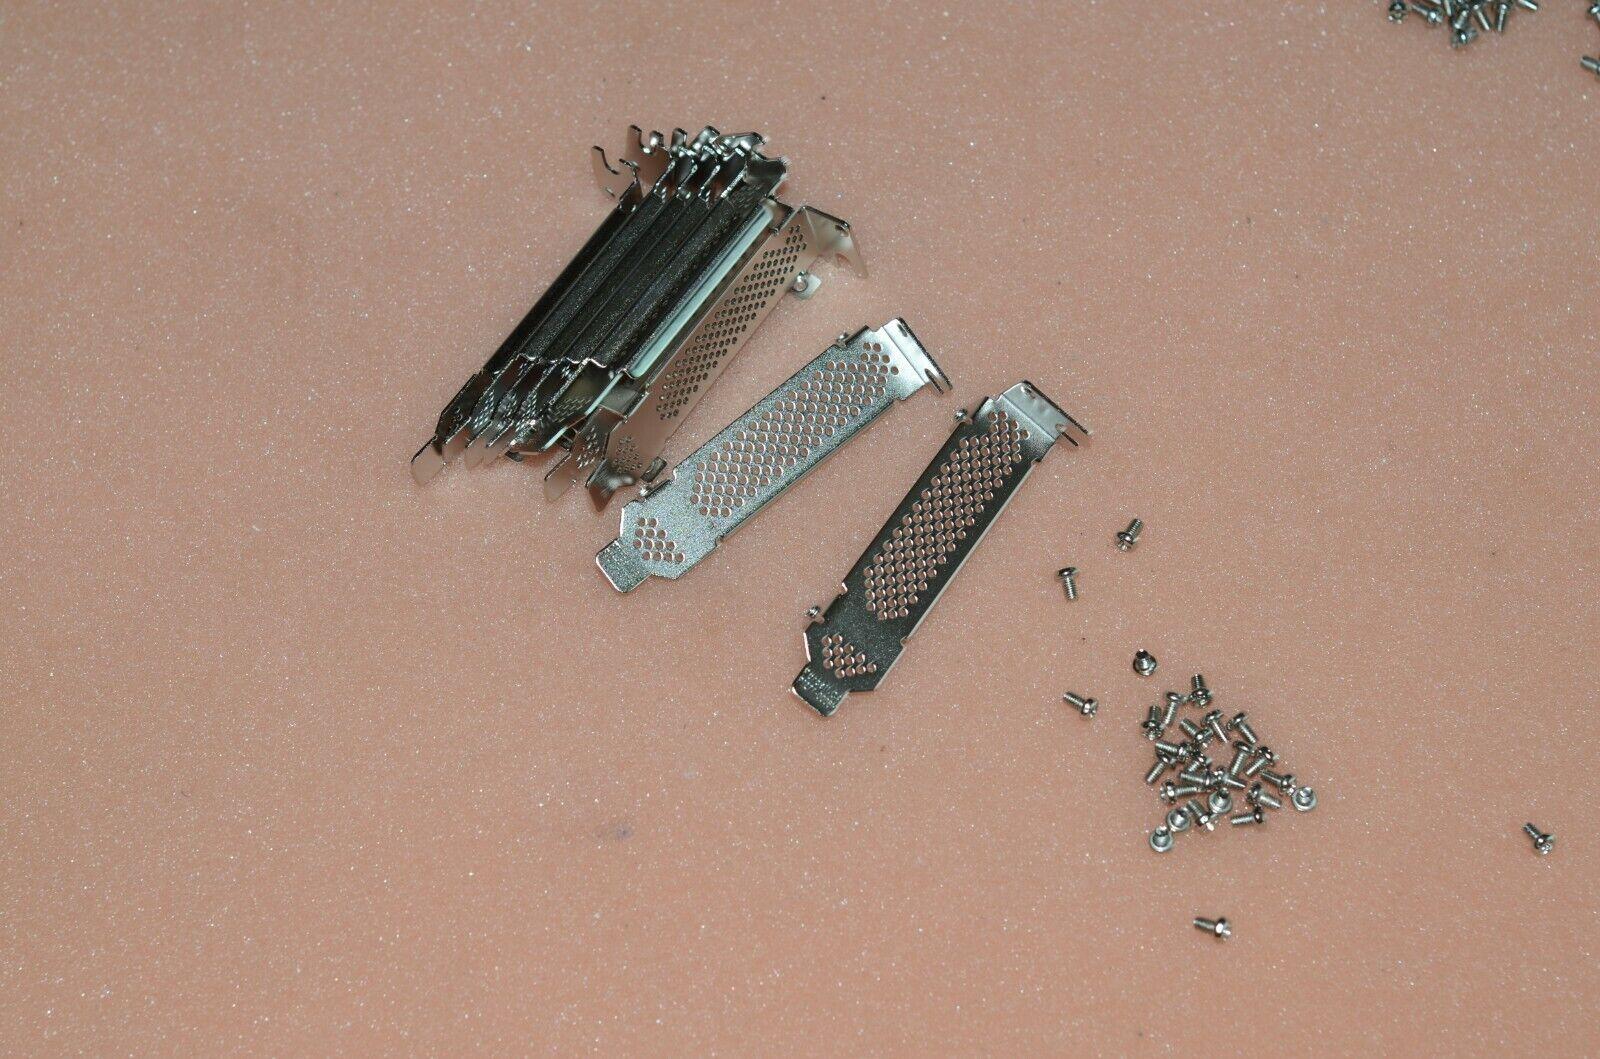 LOT OF1000 Low-Profile Bracket for LSI 9260-4i 9260-8i 9240-4i 9240-8i 9261-8i